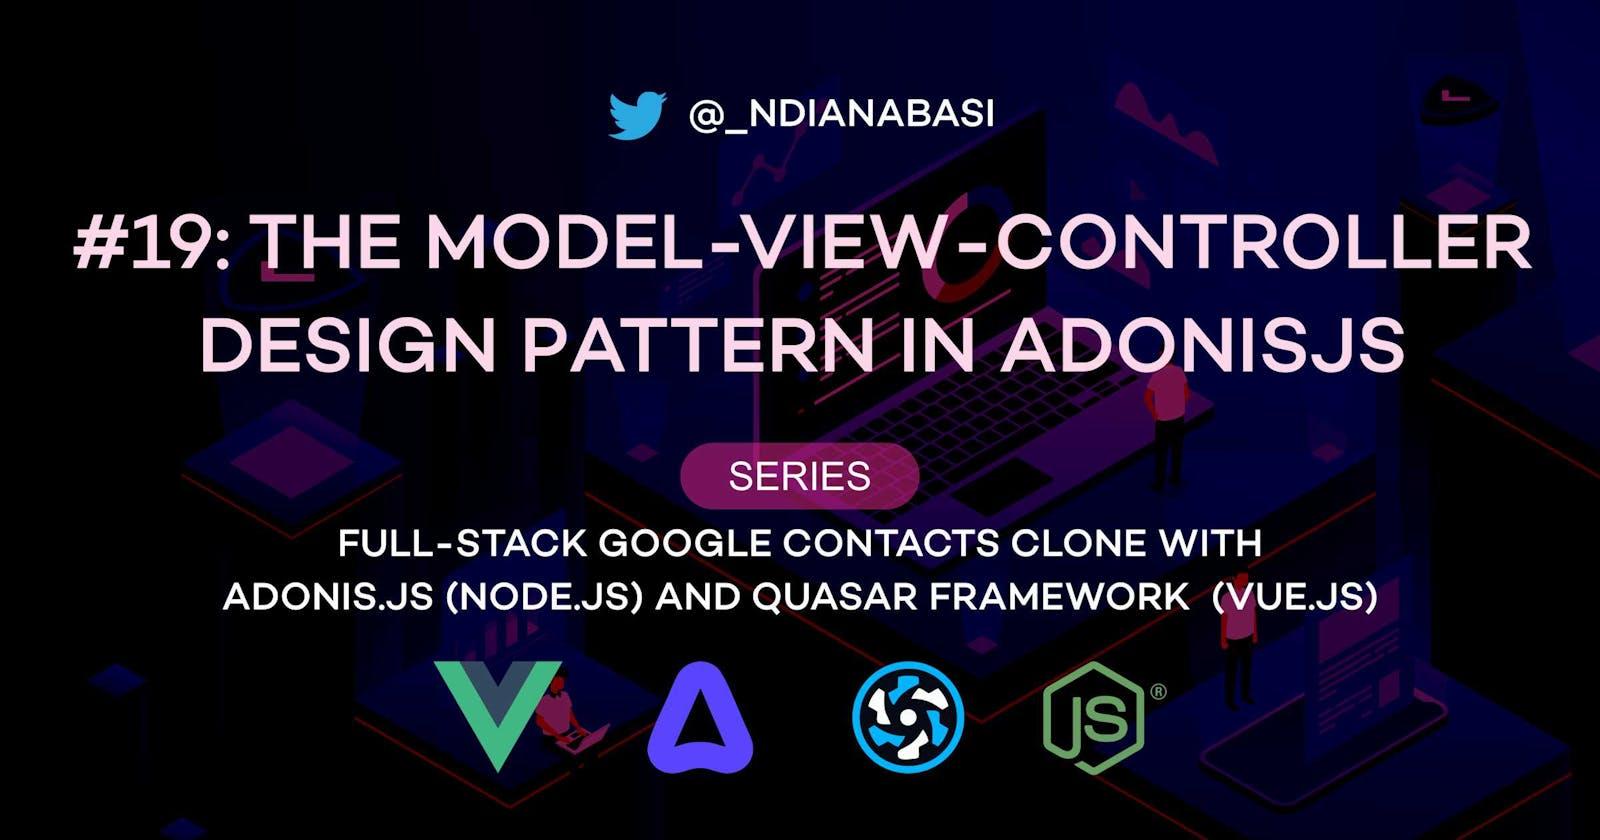 The Model-View-Controller Design Pattern in AdonisJS | Full-Stack Google Contacts Clone with AdonisJS (Node.js) and Quasar Framework (Vue.js)